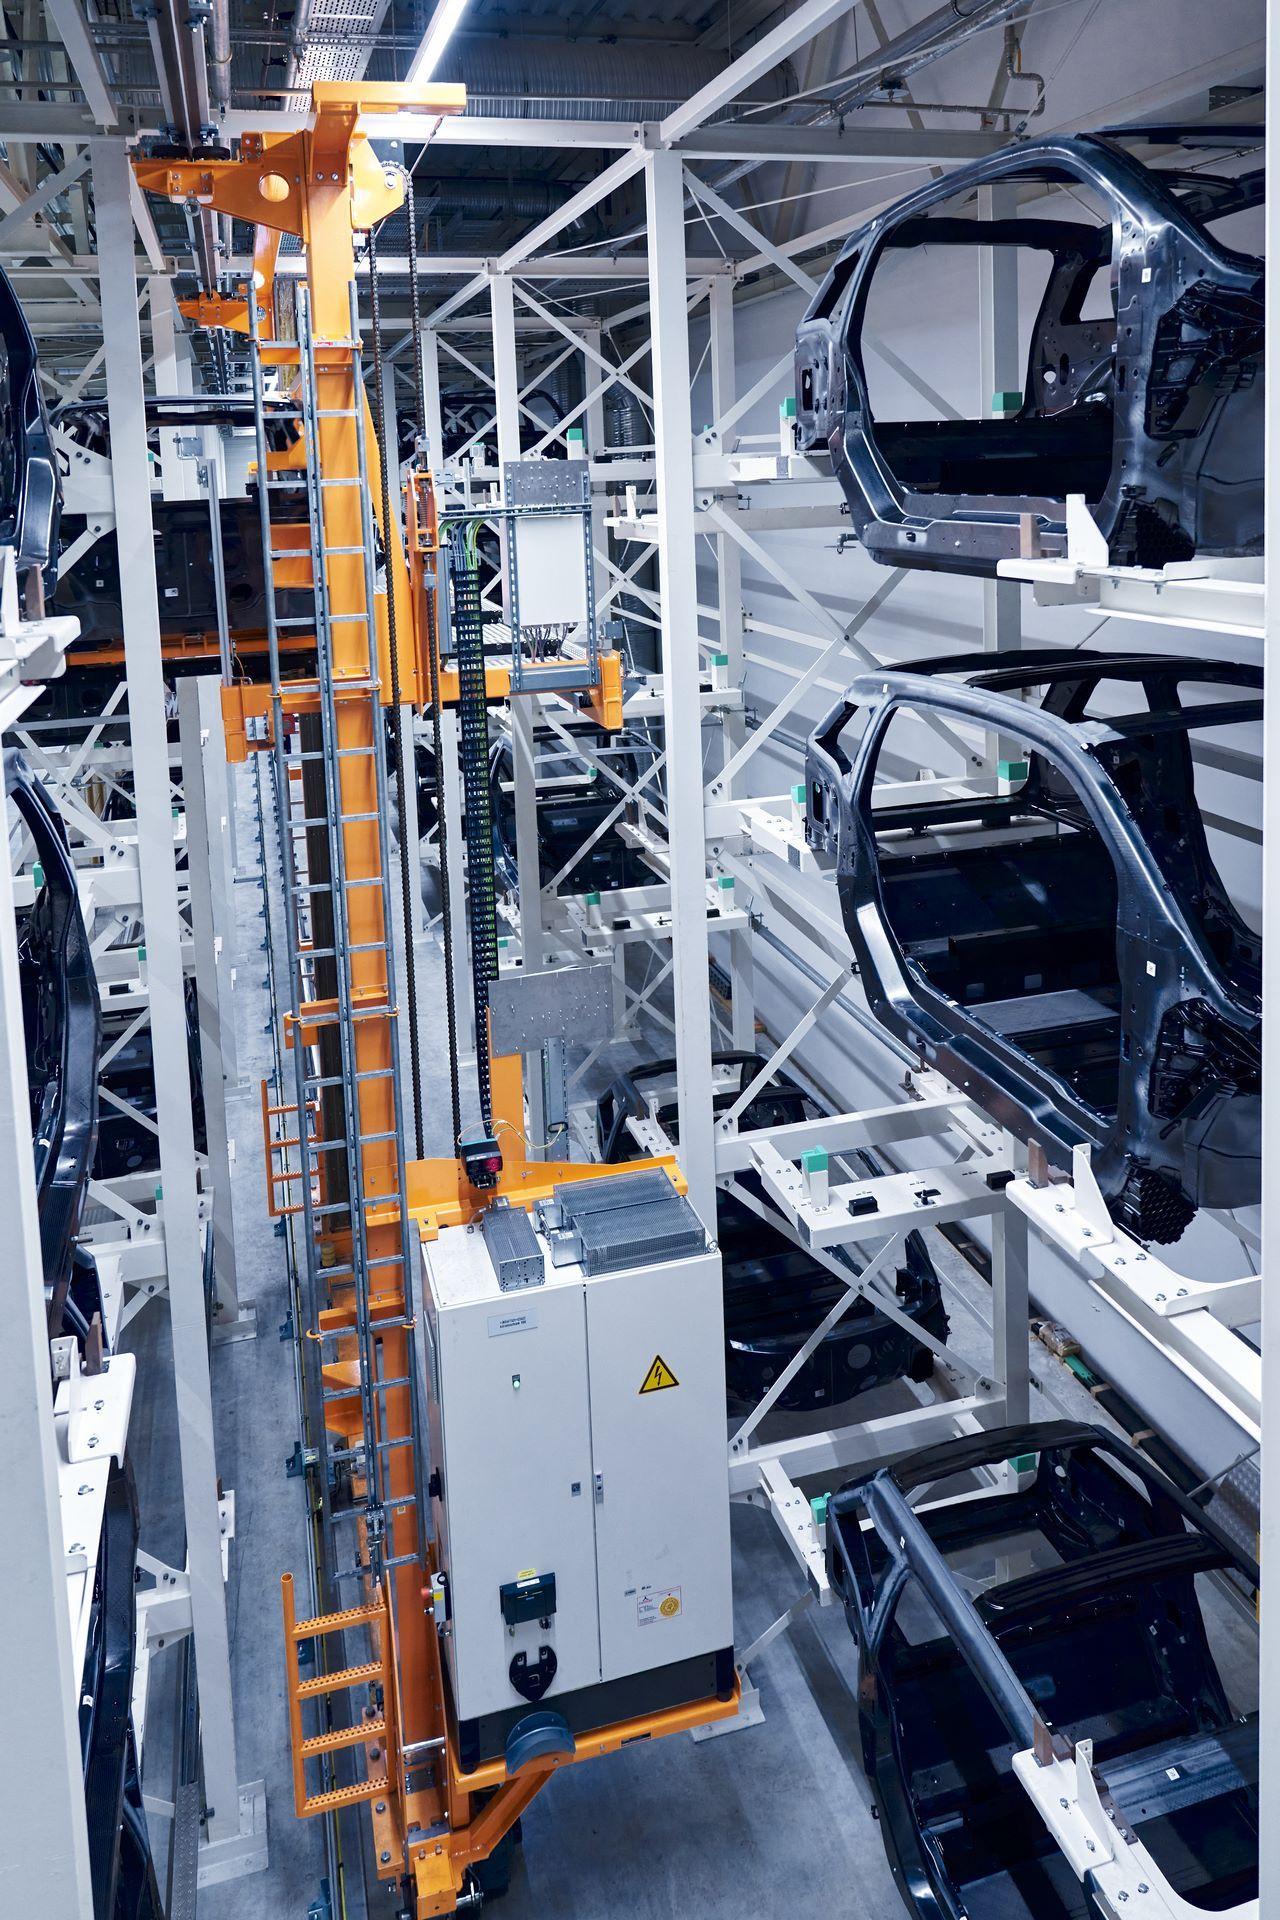 BMW-i8-plant-production-64